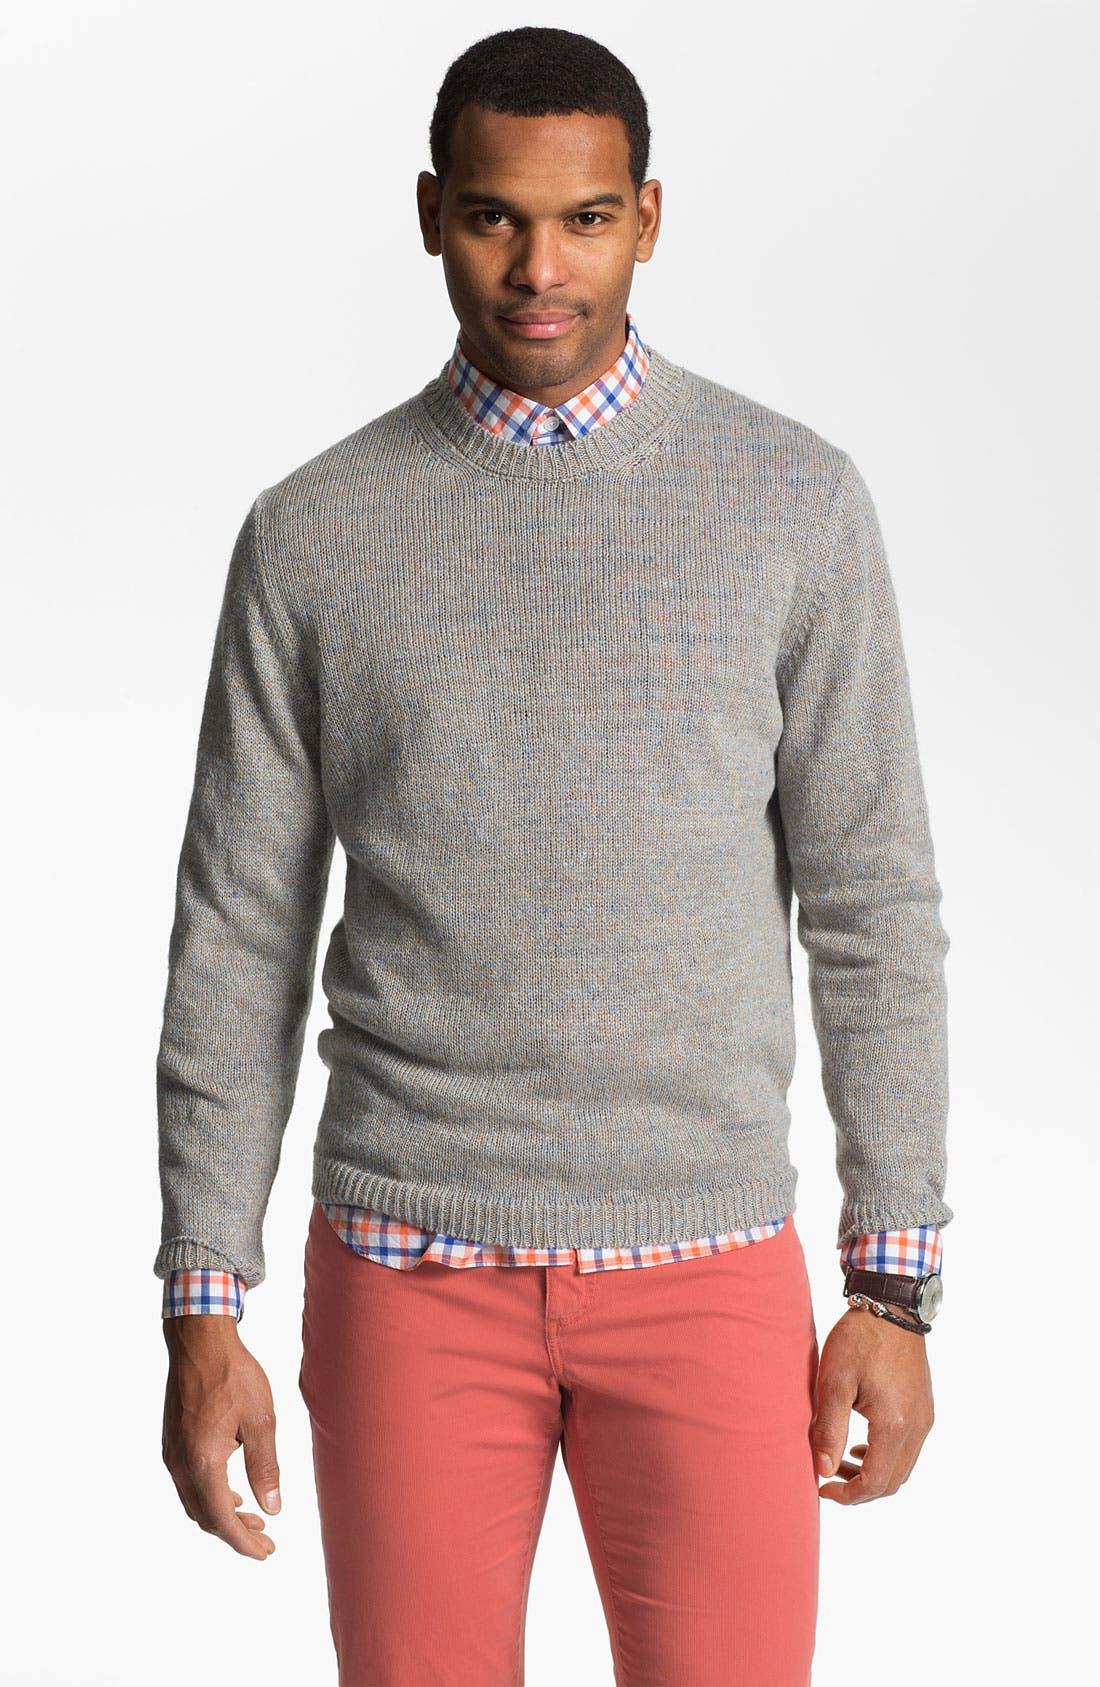 Alternate Image 1 Selected - Hickey Freeman 'Beach' Linen Blend Sweater